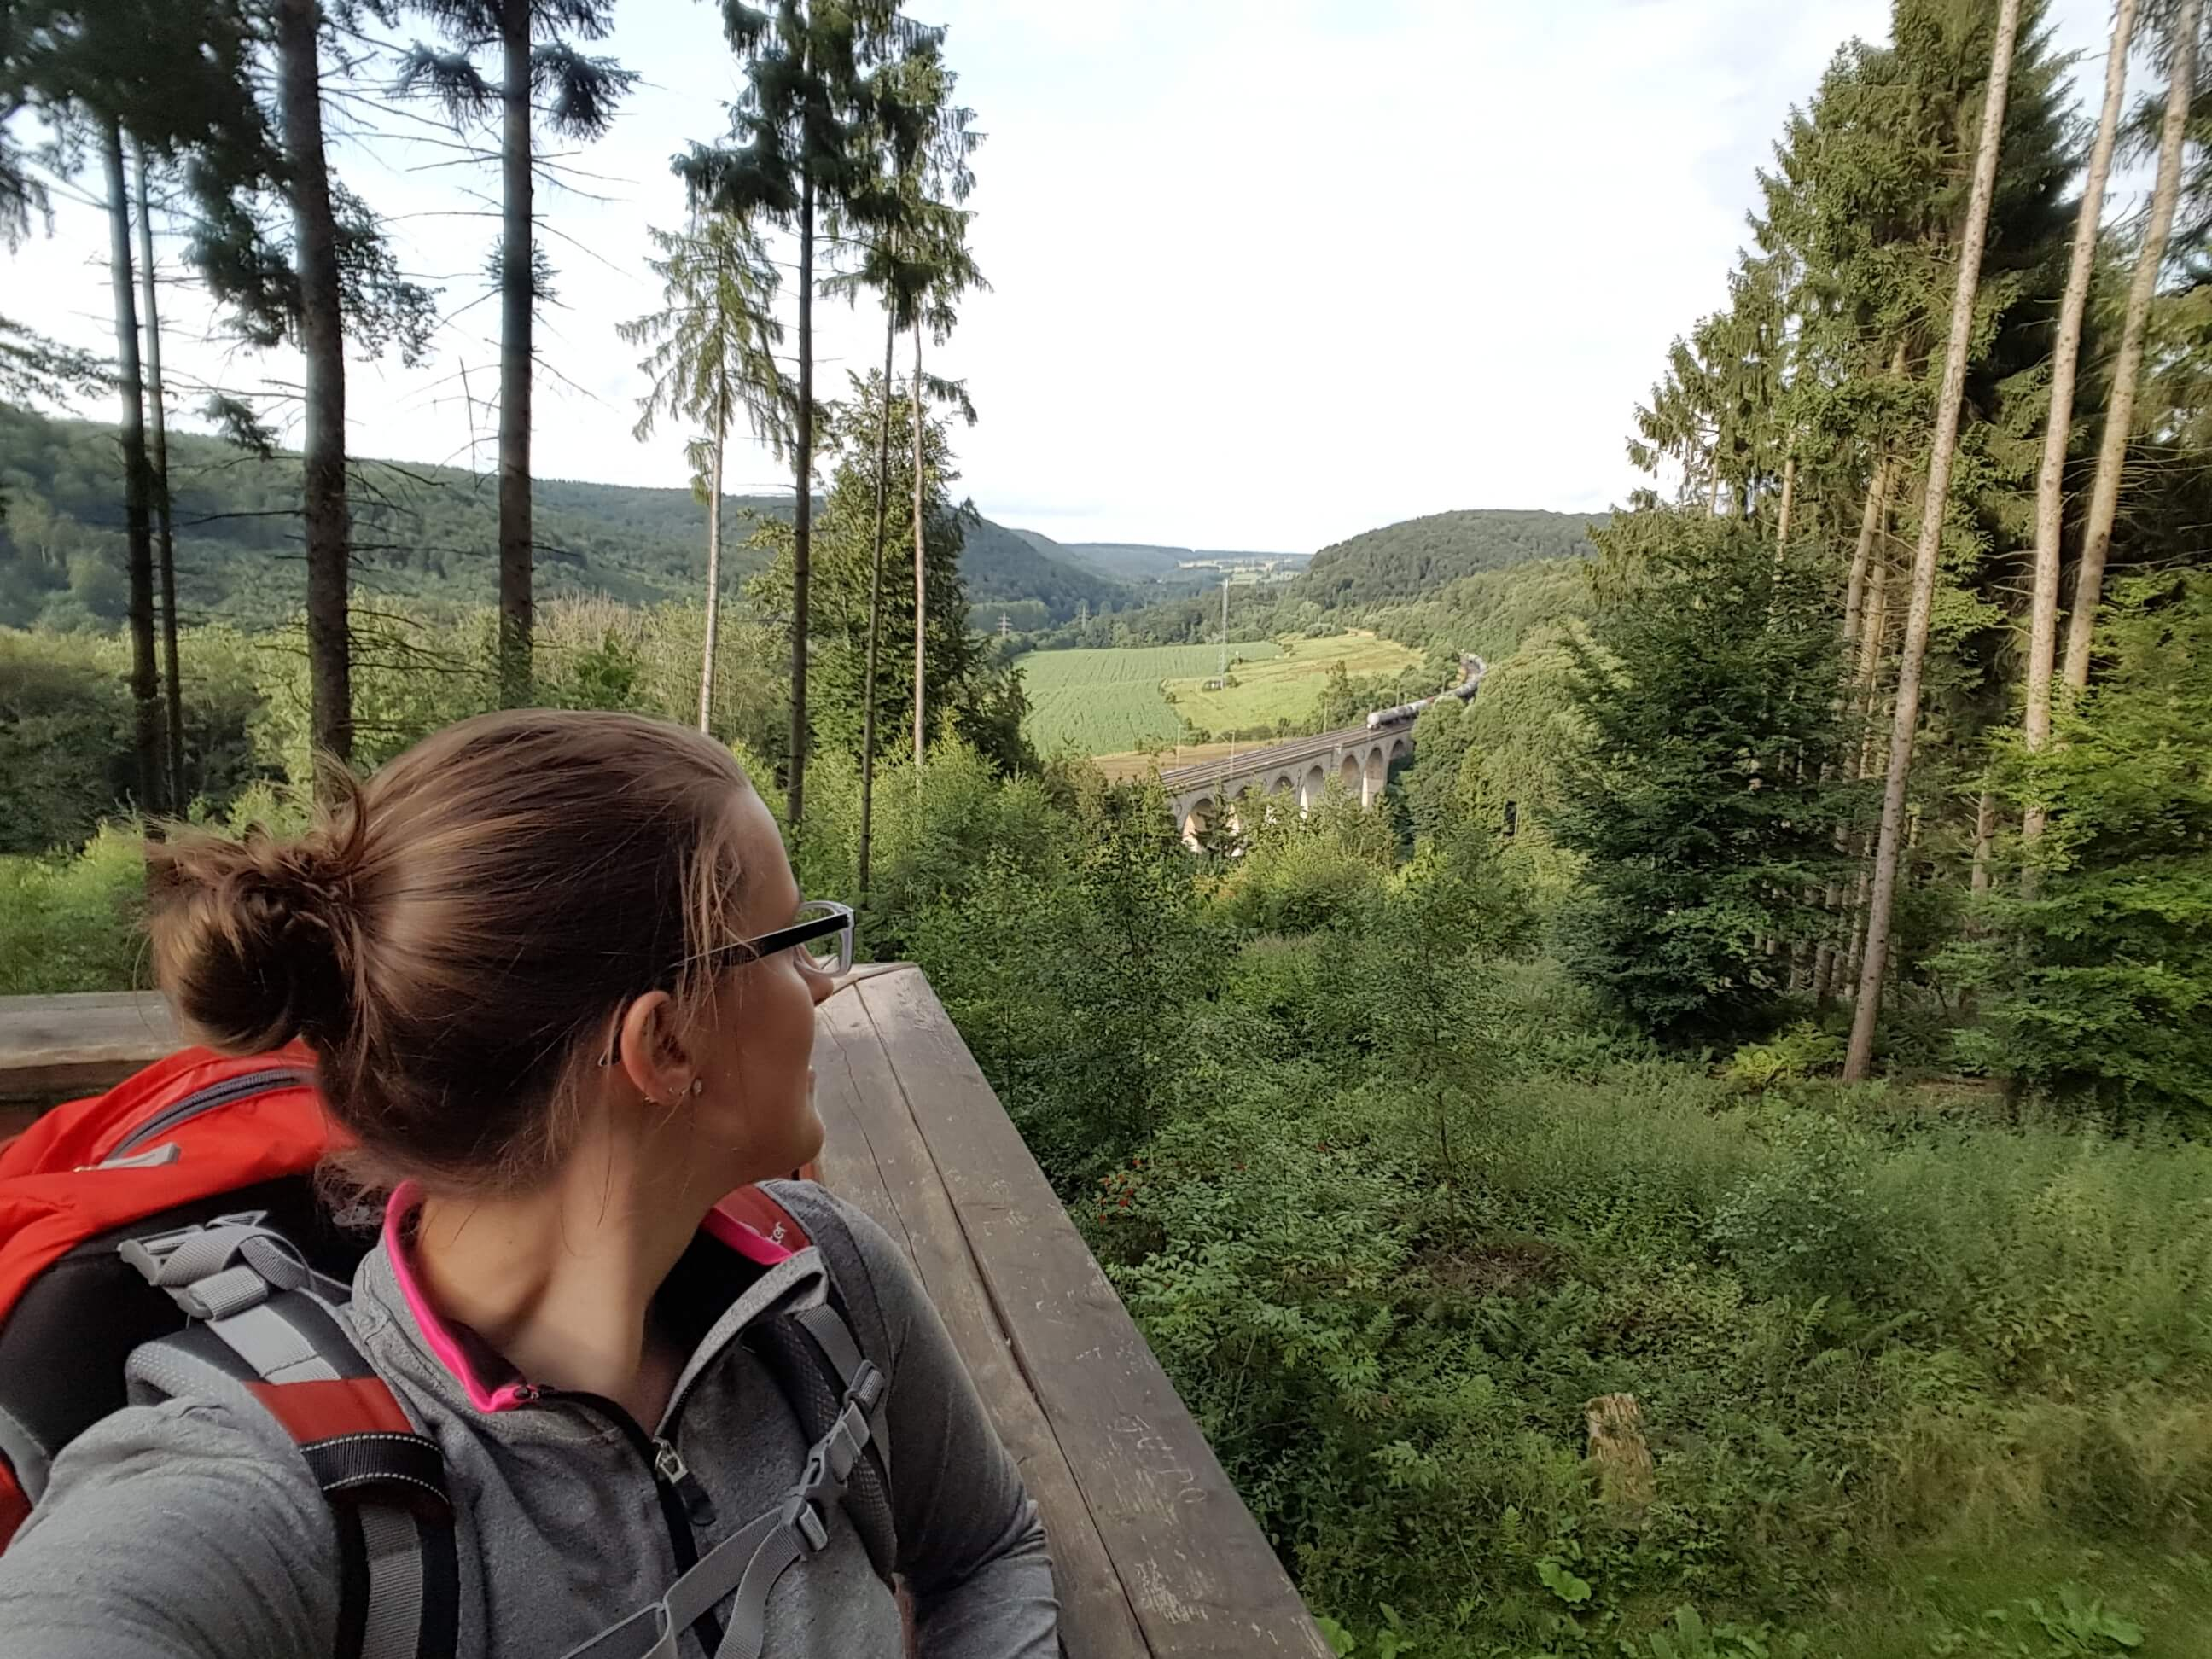 Panoramablick auf den kleinen Viadukt